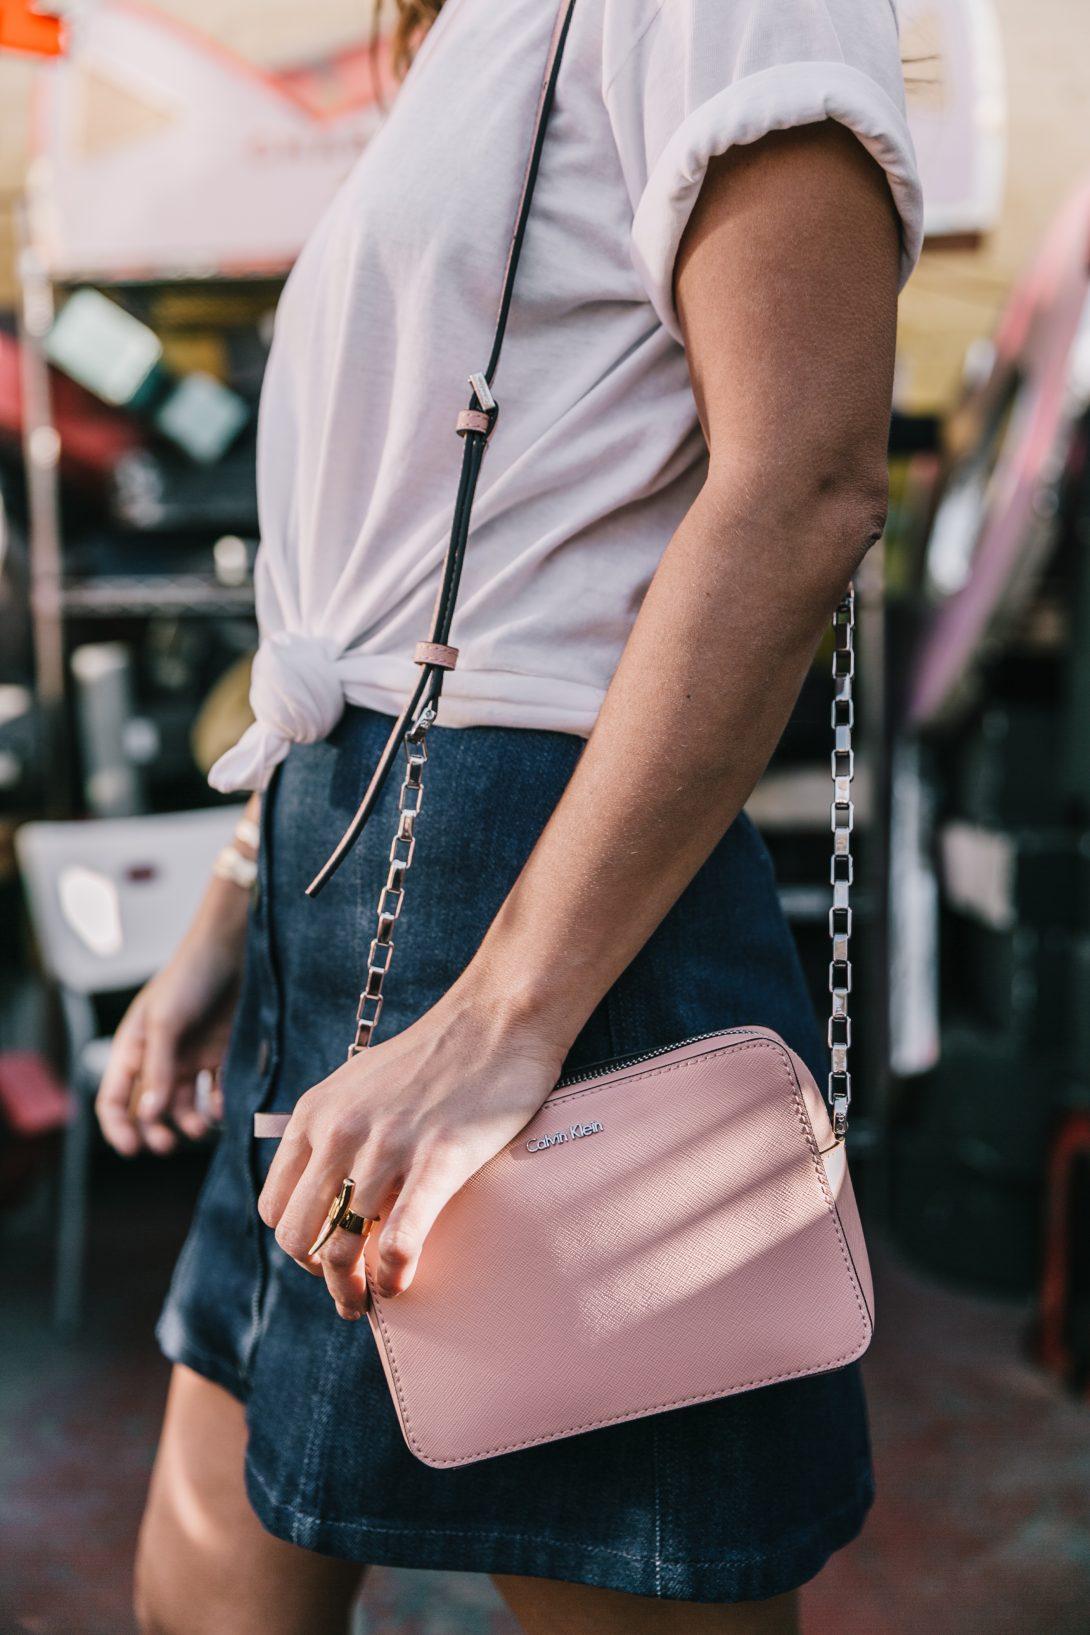 Calvin_Klein-Denim_Skirt-CK_Collection-Los_Angeles-Nick_Metropolis-Saint_Laurent_Sneakers-Pink_Bag-Outfit-Collage_Vintage--15